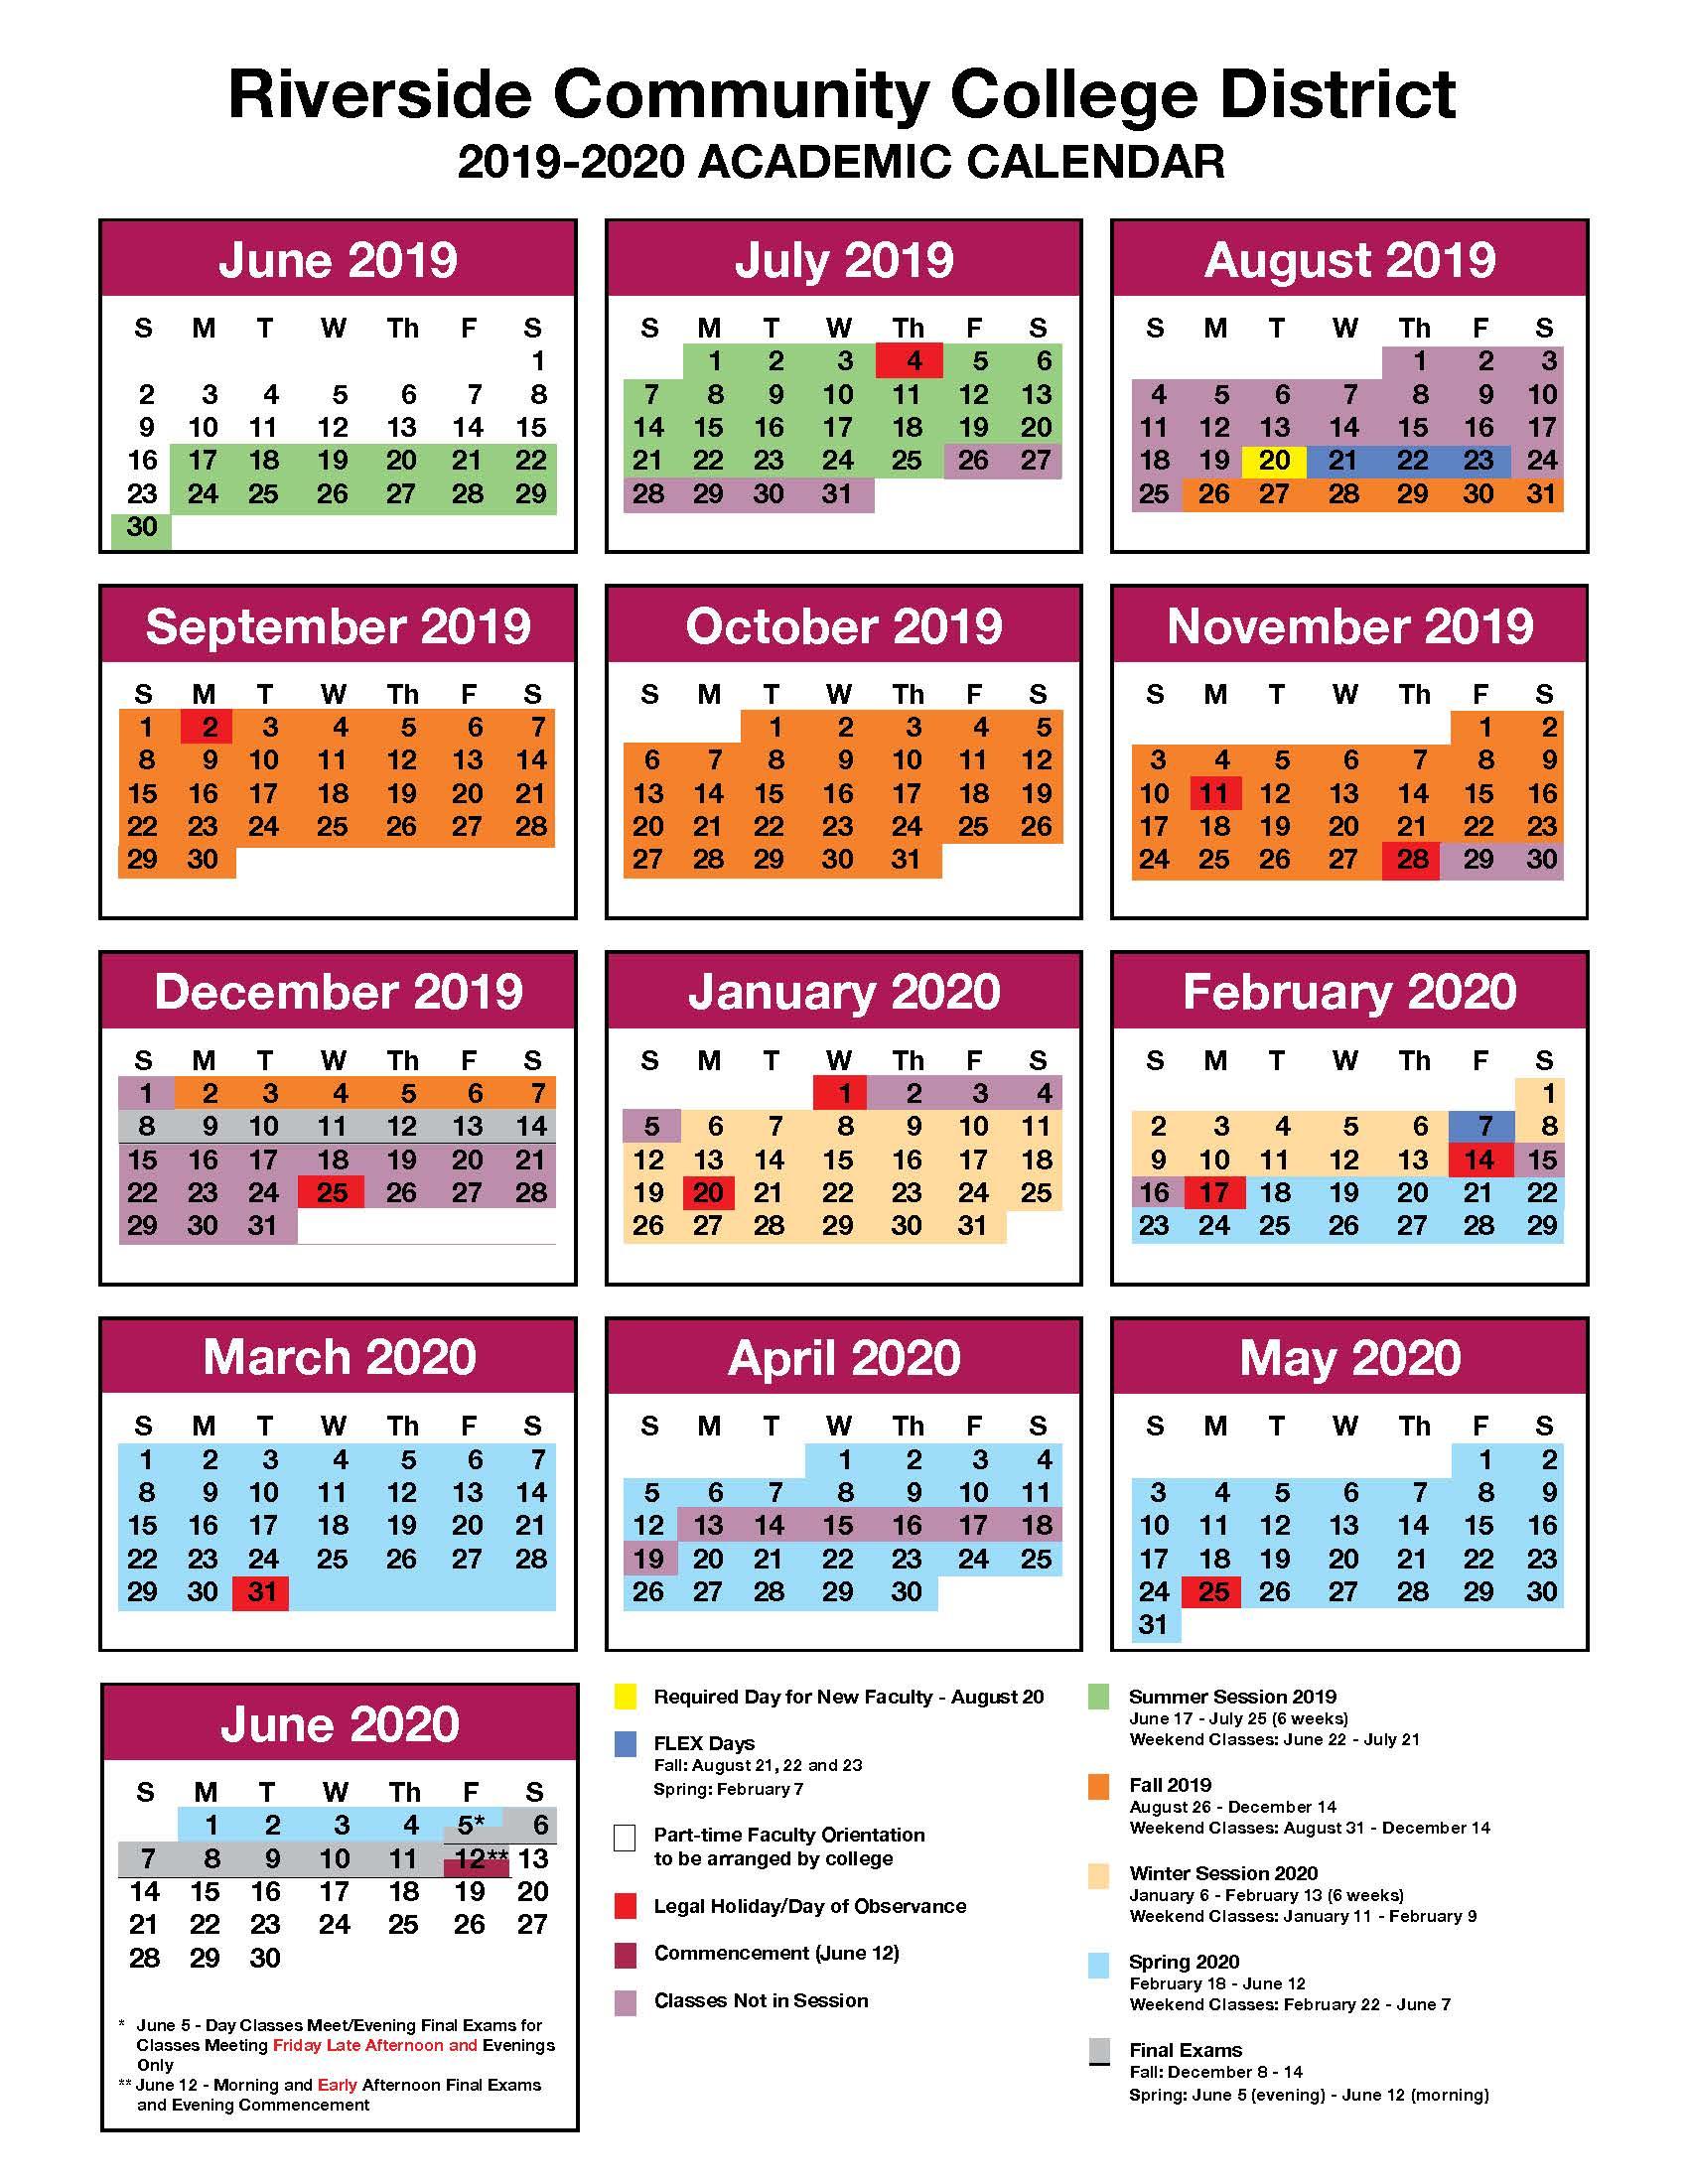 Jfk And Norco College Calendar 2019 2020 – John F. Kennedy In Diamond Bar High School Calendar 2020